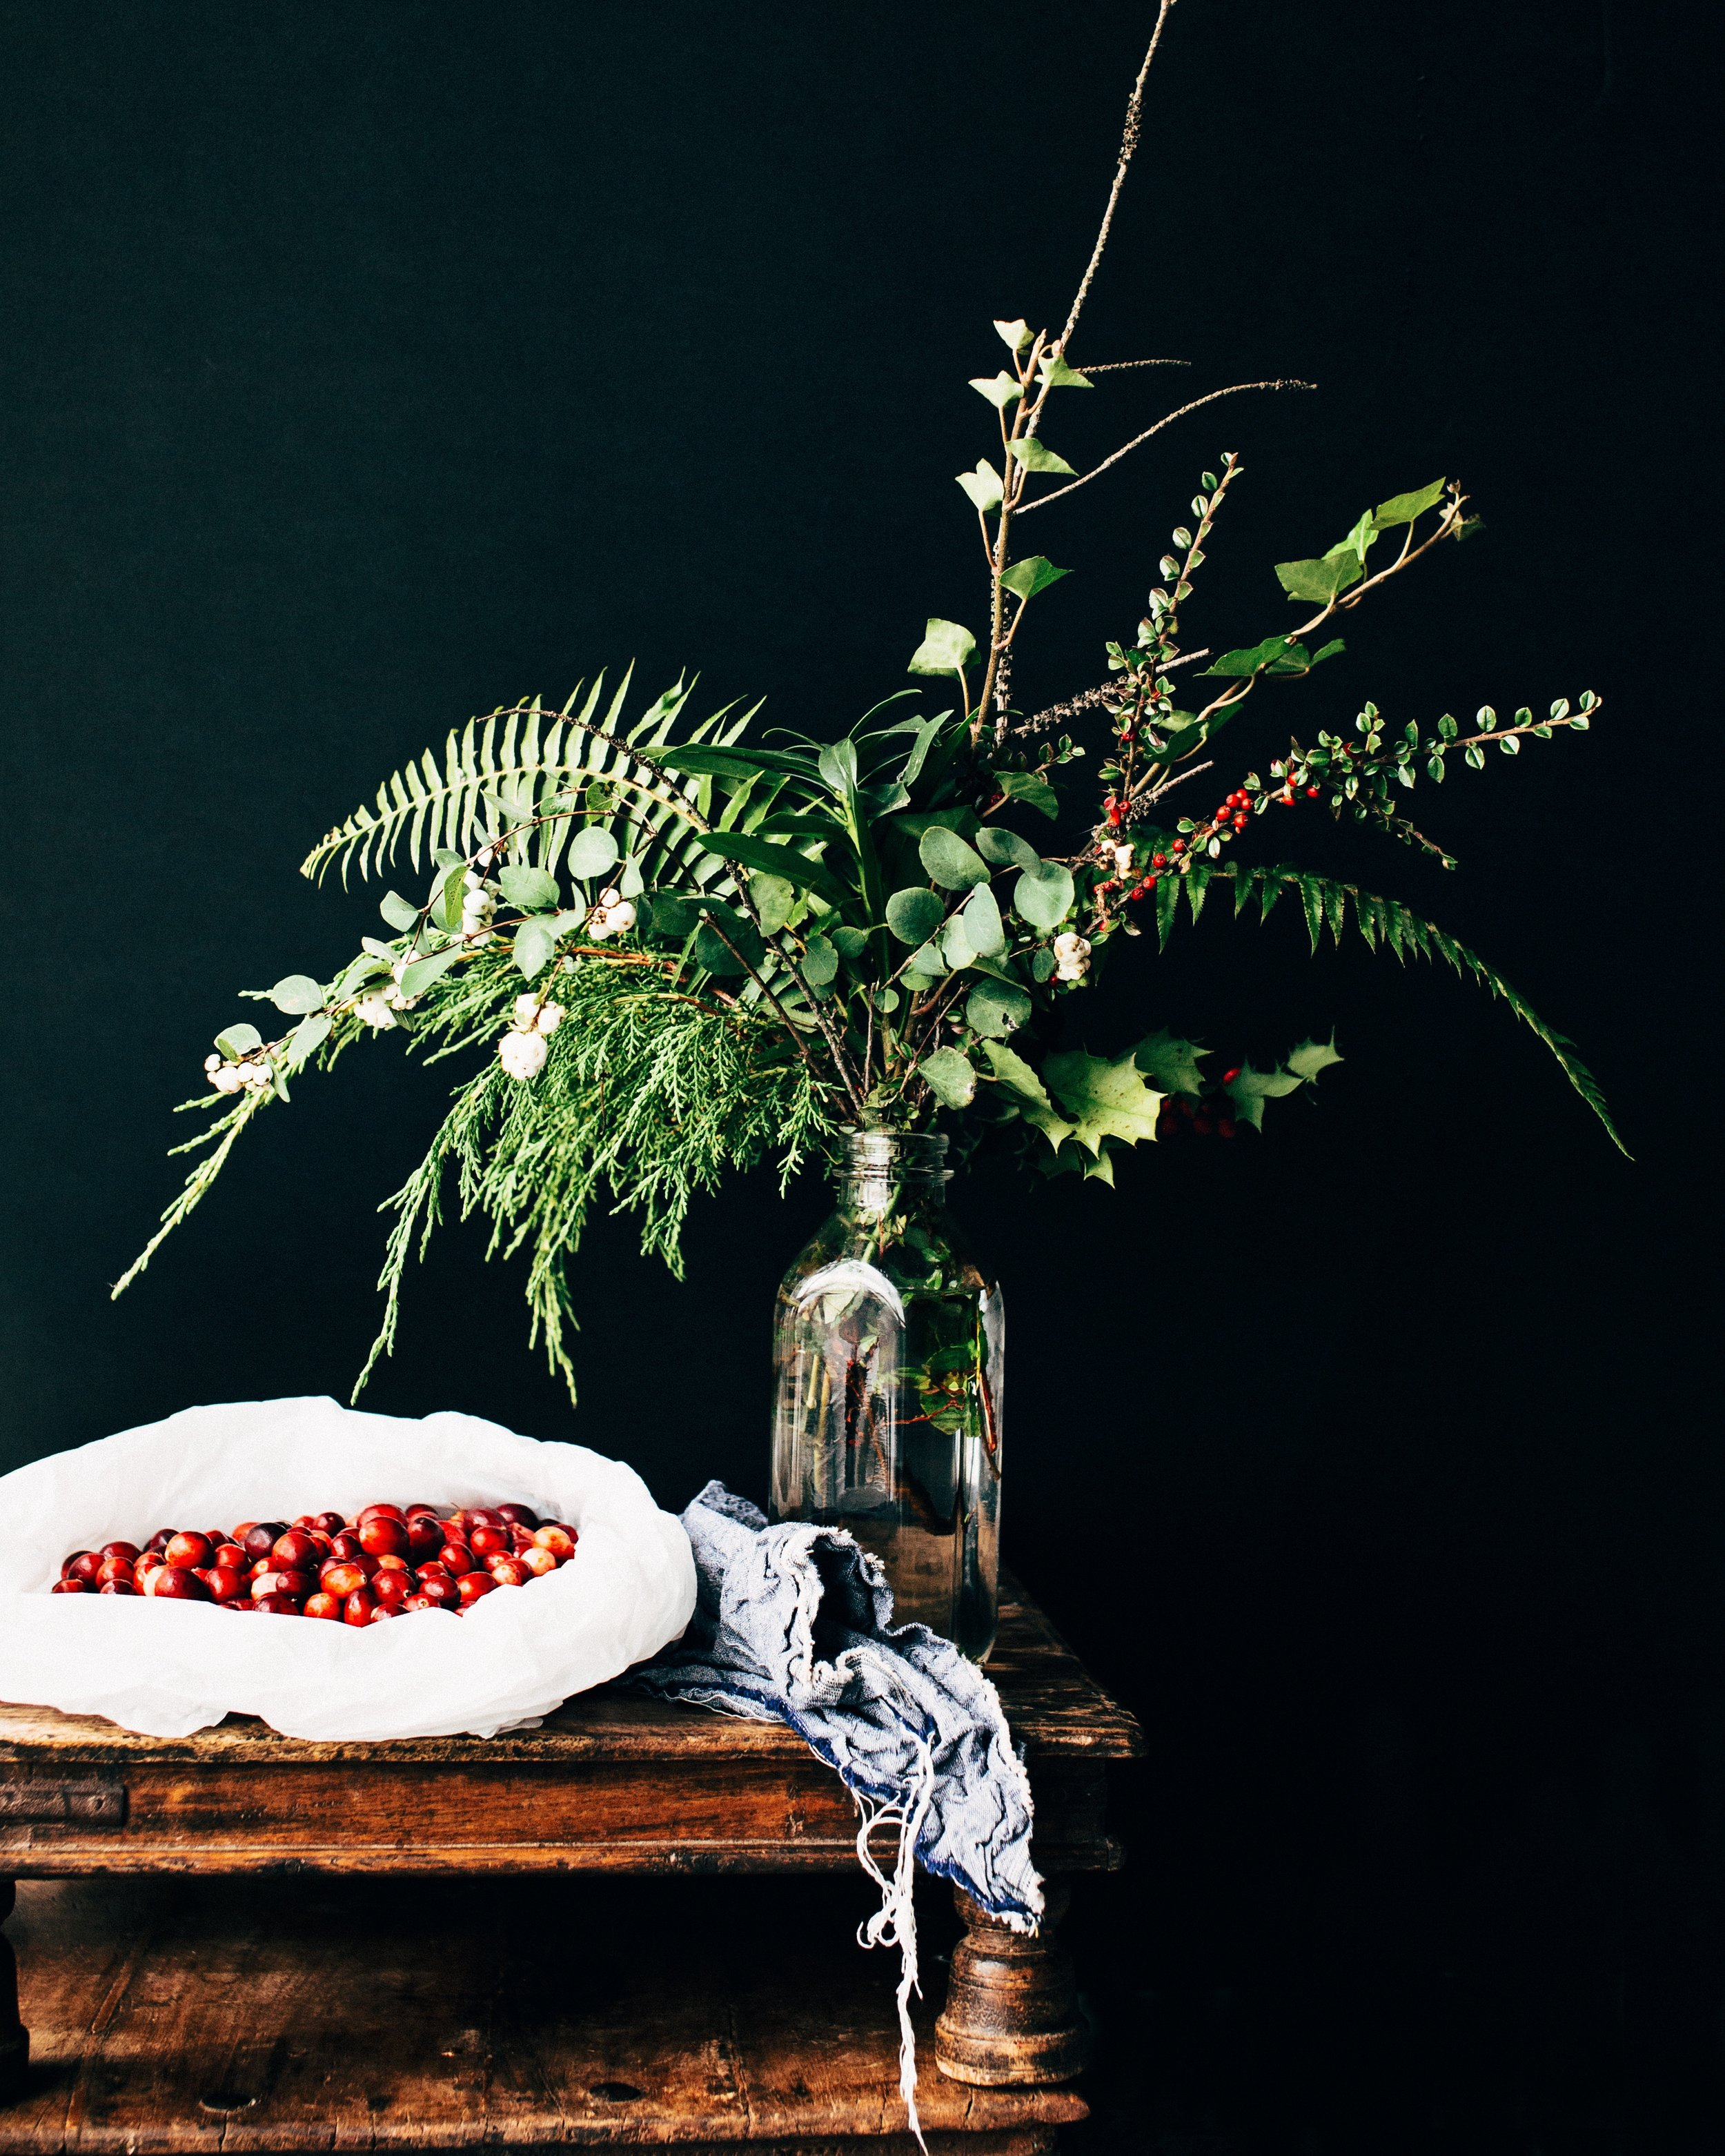 food-photographer-jennifer-pallian-145421-unsplash.jpg